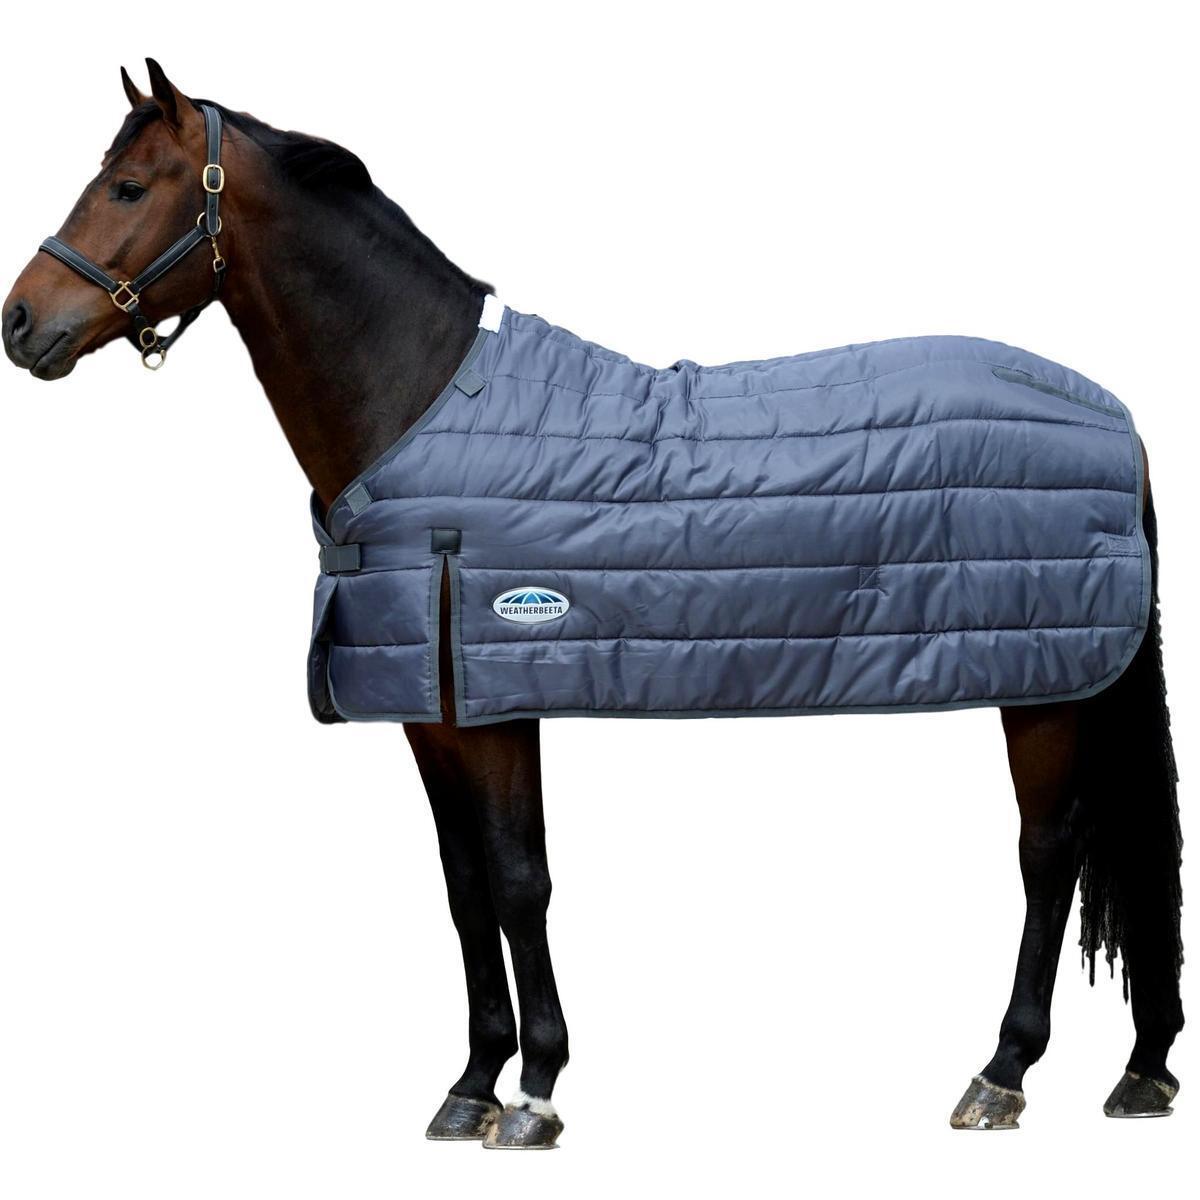 Weatherbeeta Comfitec Premier Trio Blanket Liner with Memory Foam